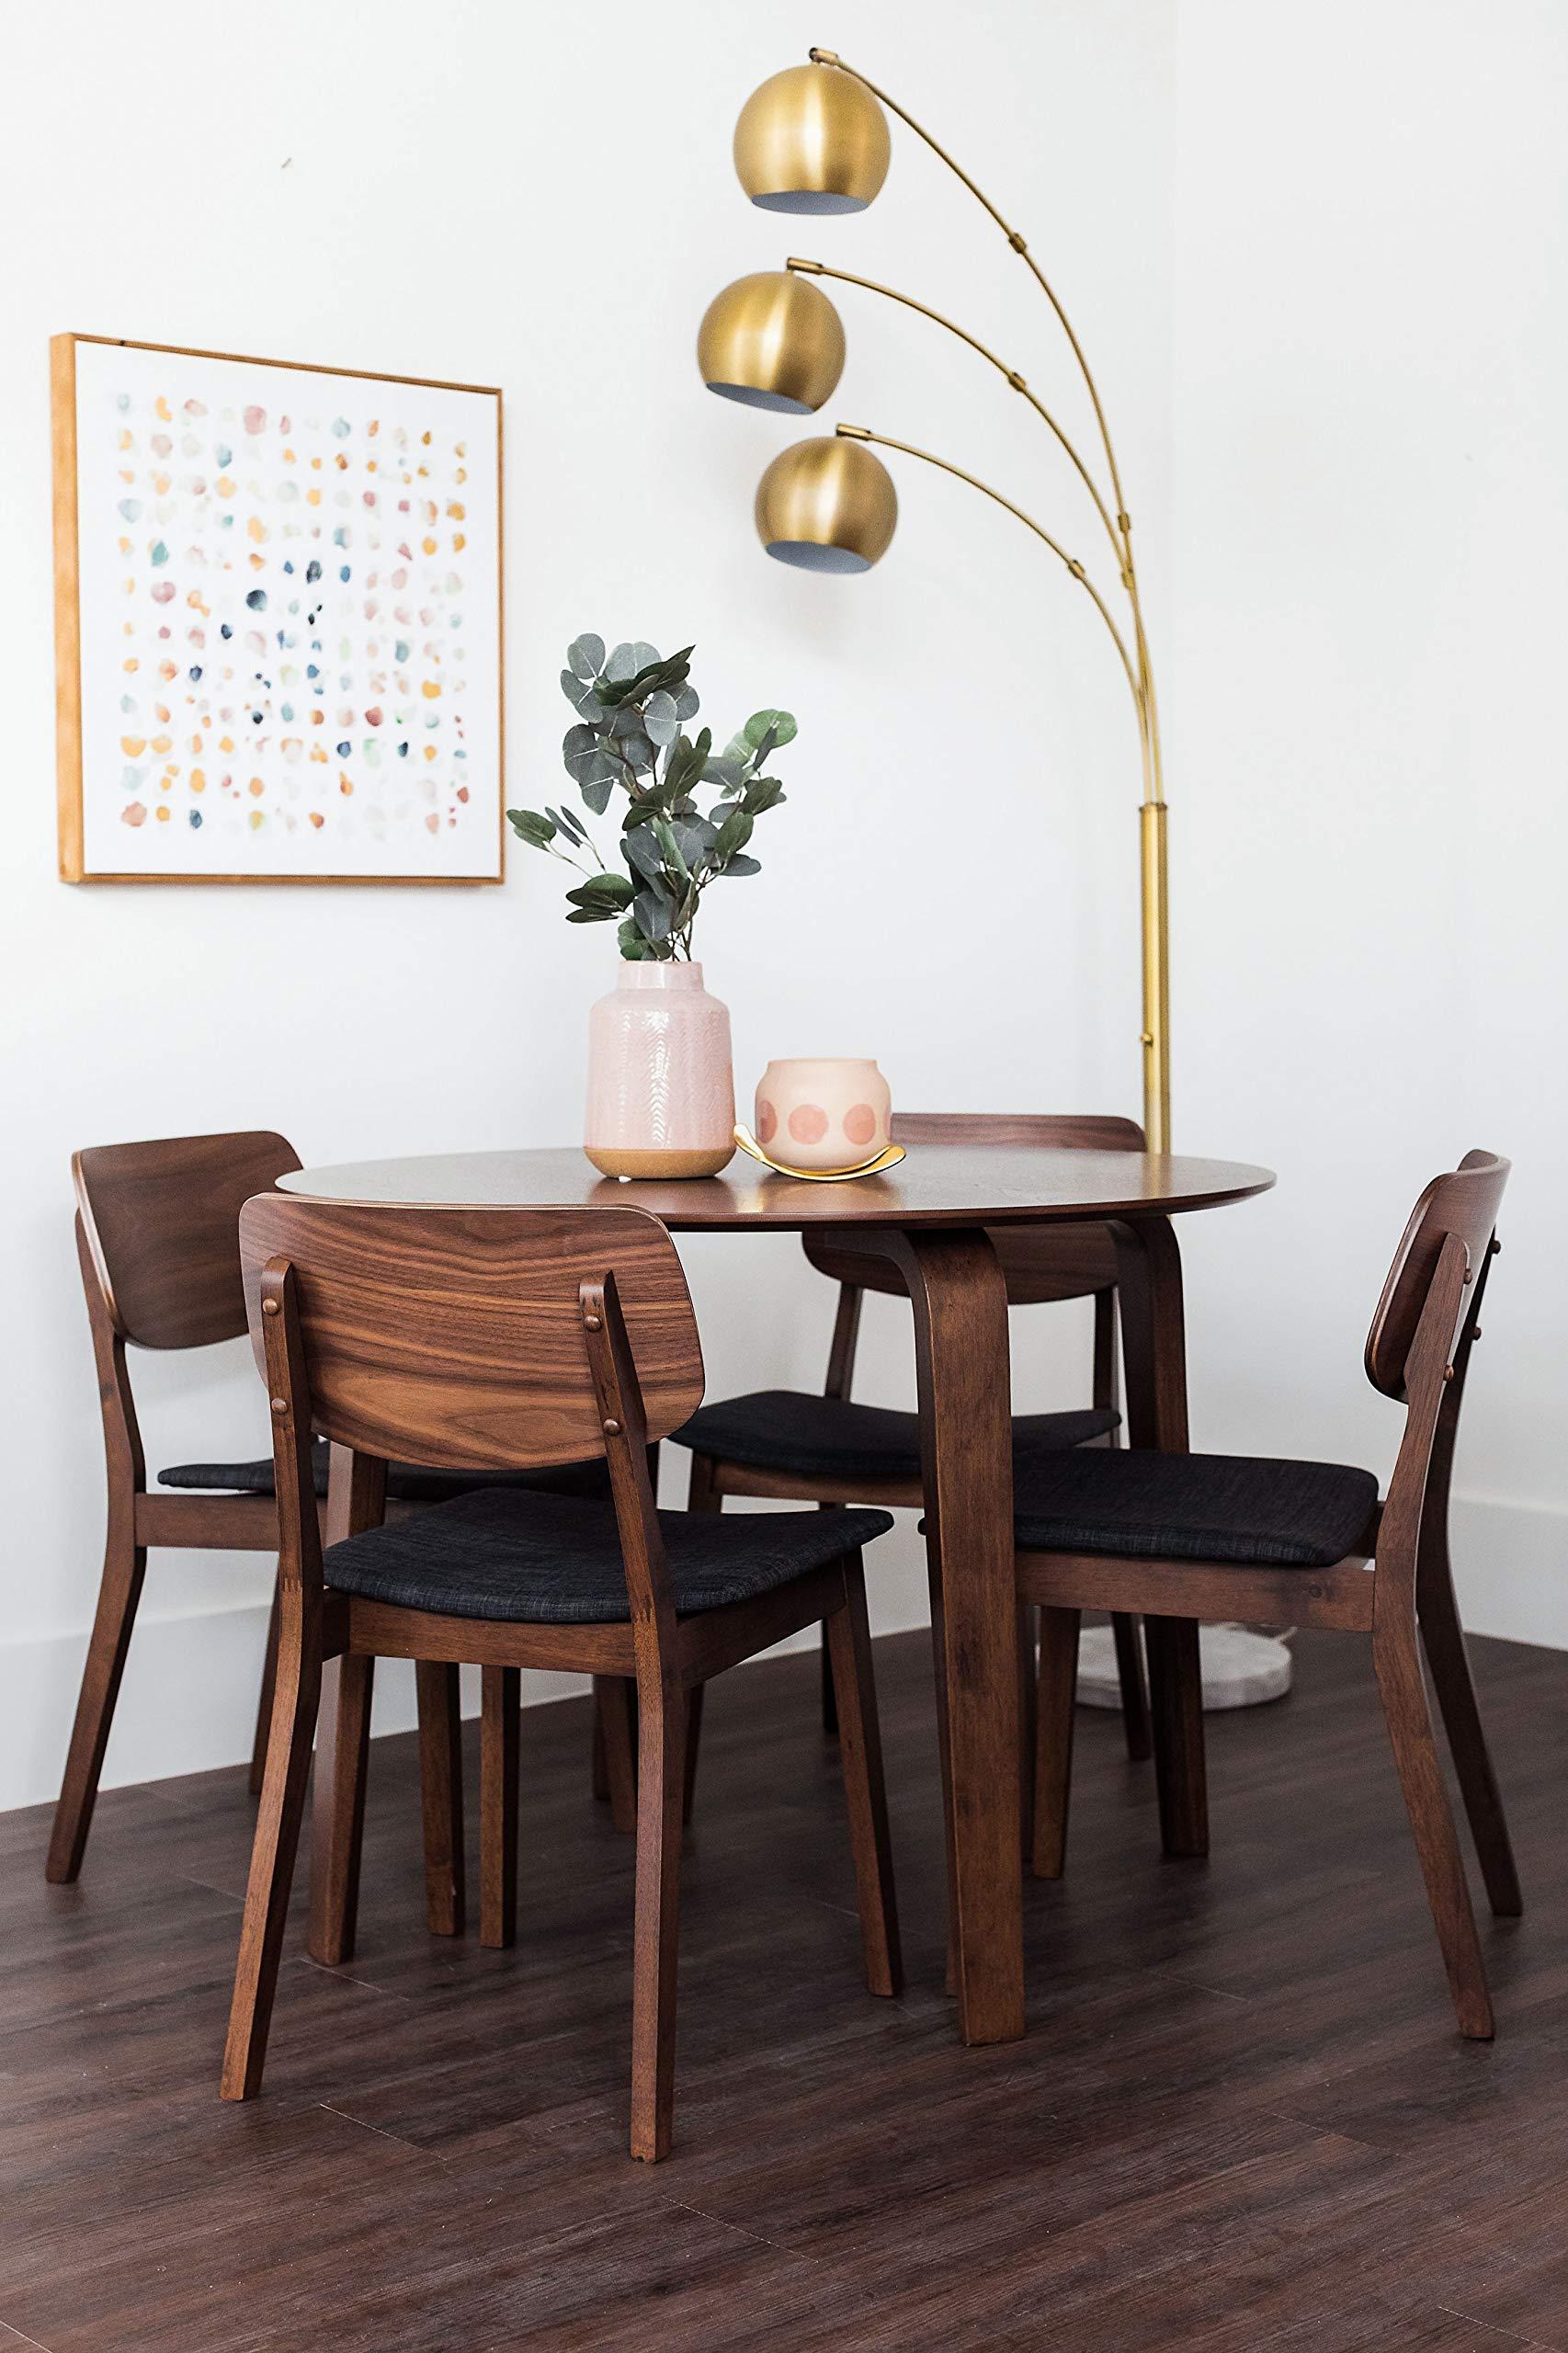 Edloe Finch YUMI Mid-Century Modern Round Dining Table Kitchen Walnut by Edloe Finch (Image #3)